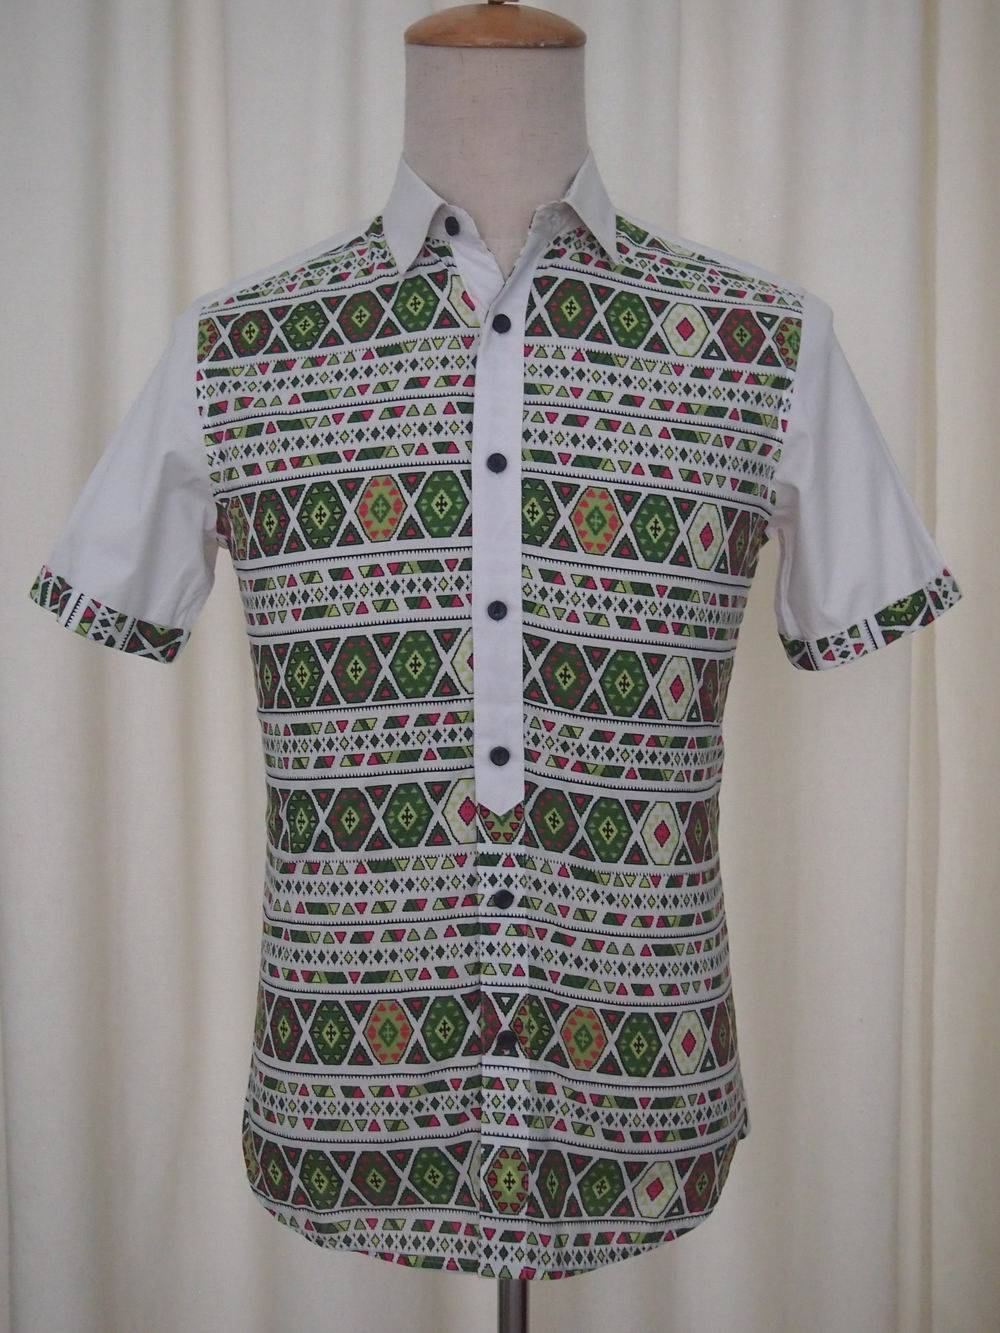 Summer Men's Short Sleeve Shirt 100% cotton Printing series 2015Fashion NEW